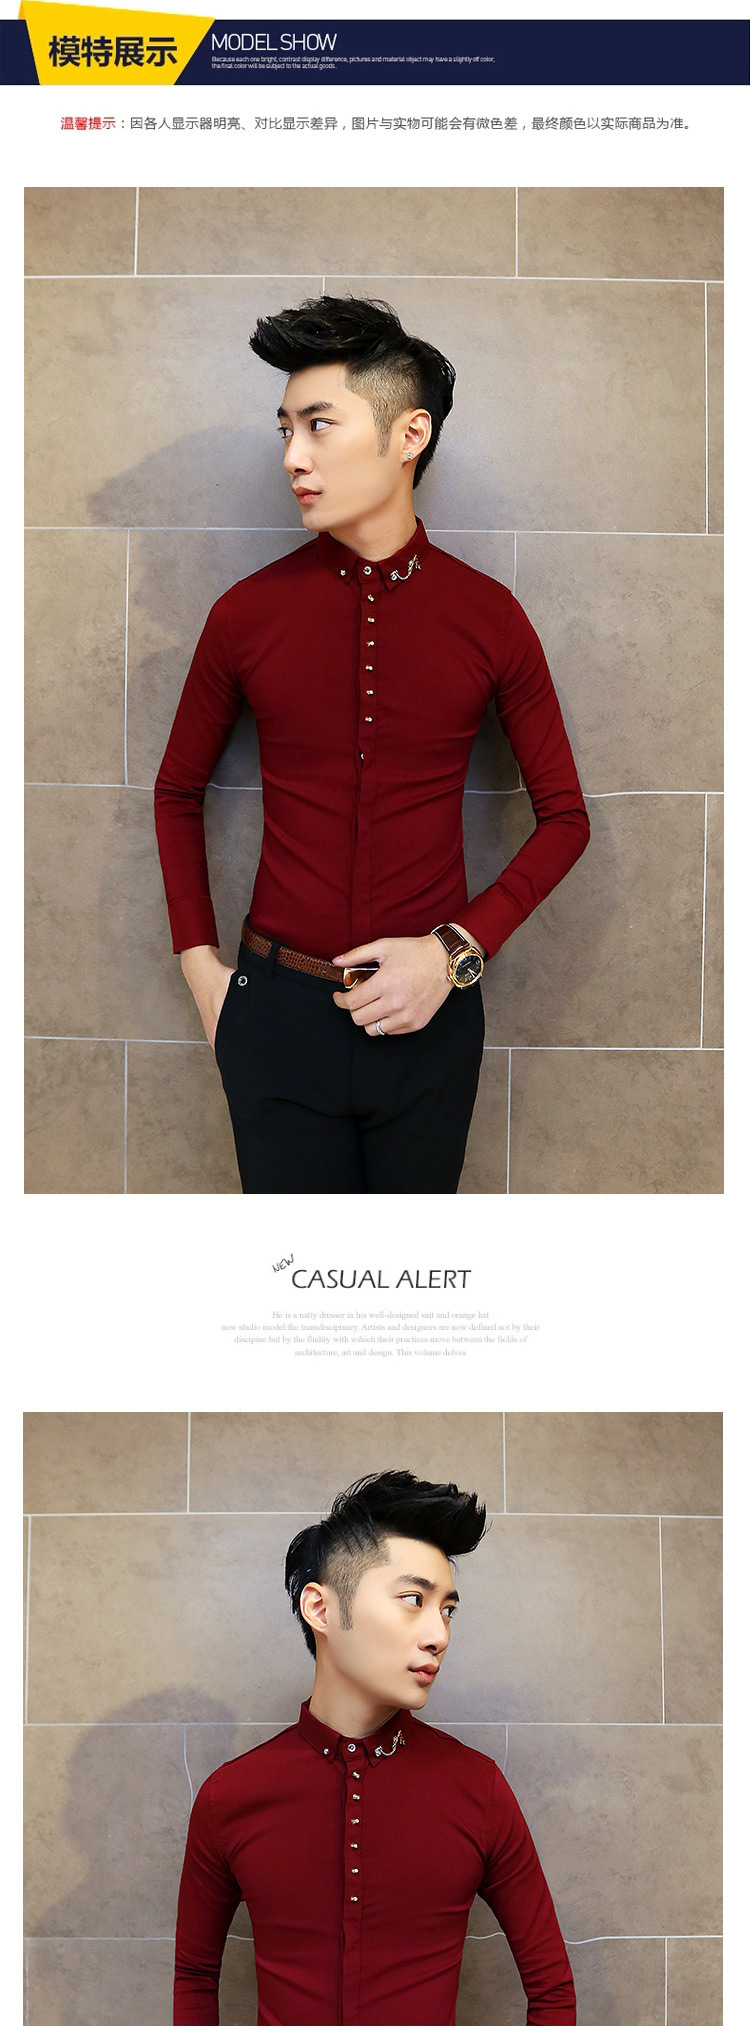 c2潮朝理发发型师男士衬衣2015英伦韩版修身长袖衬衫时尚纯色休闲衬衣